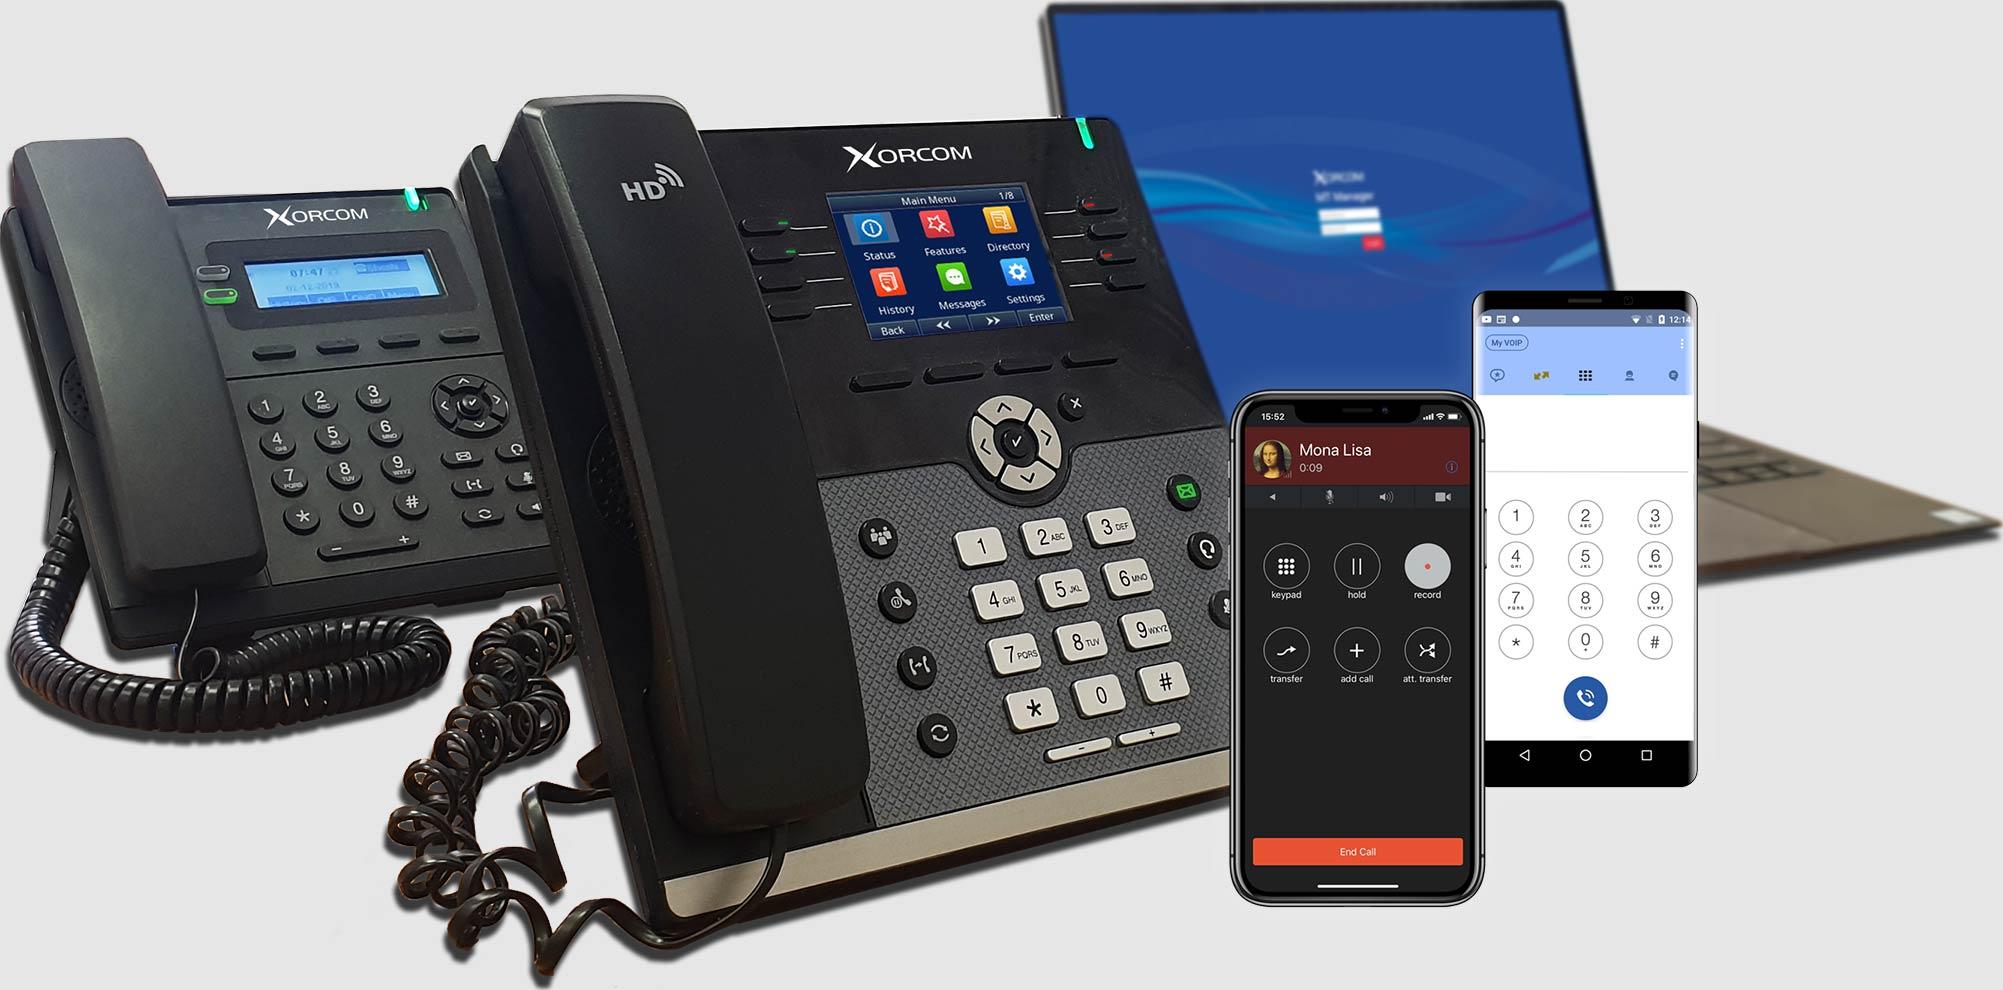 IP PBX & VoIP equipment in APAC, Papua New Guinea, Myanmar, Thailand, Indonesia, Singapore, Philippines, Vietnam